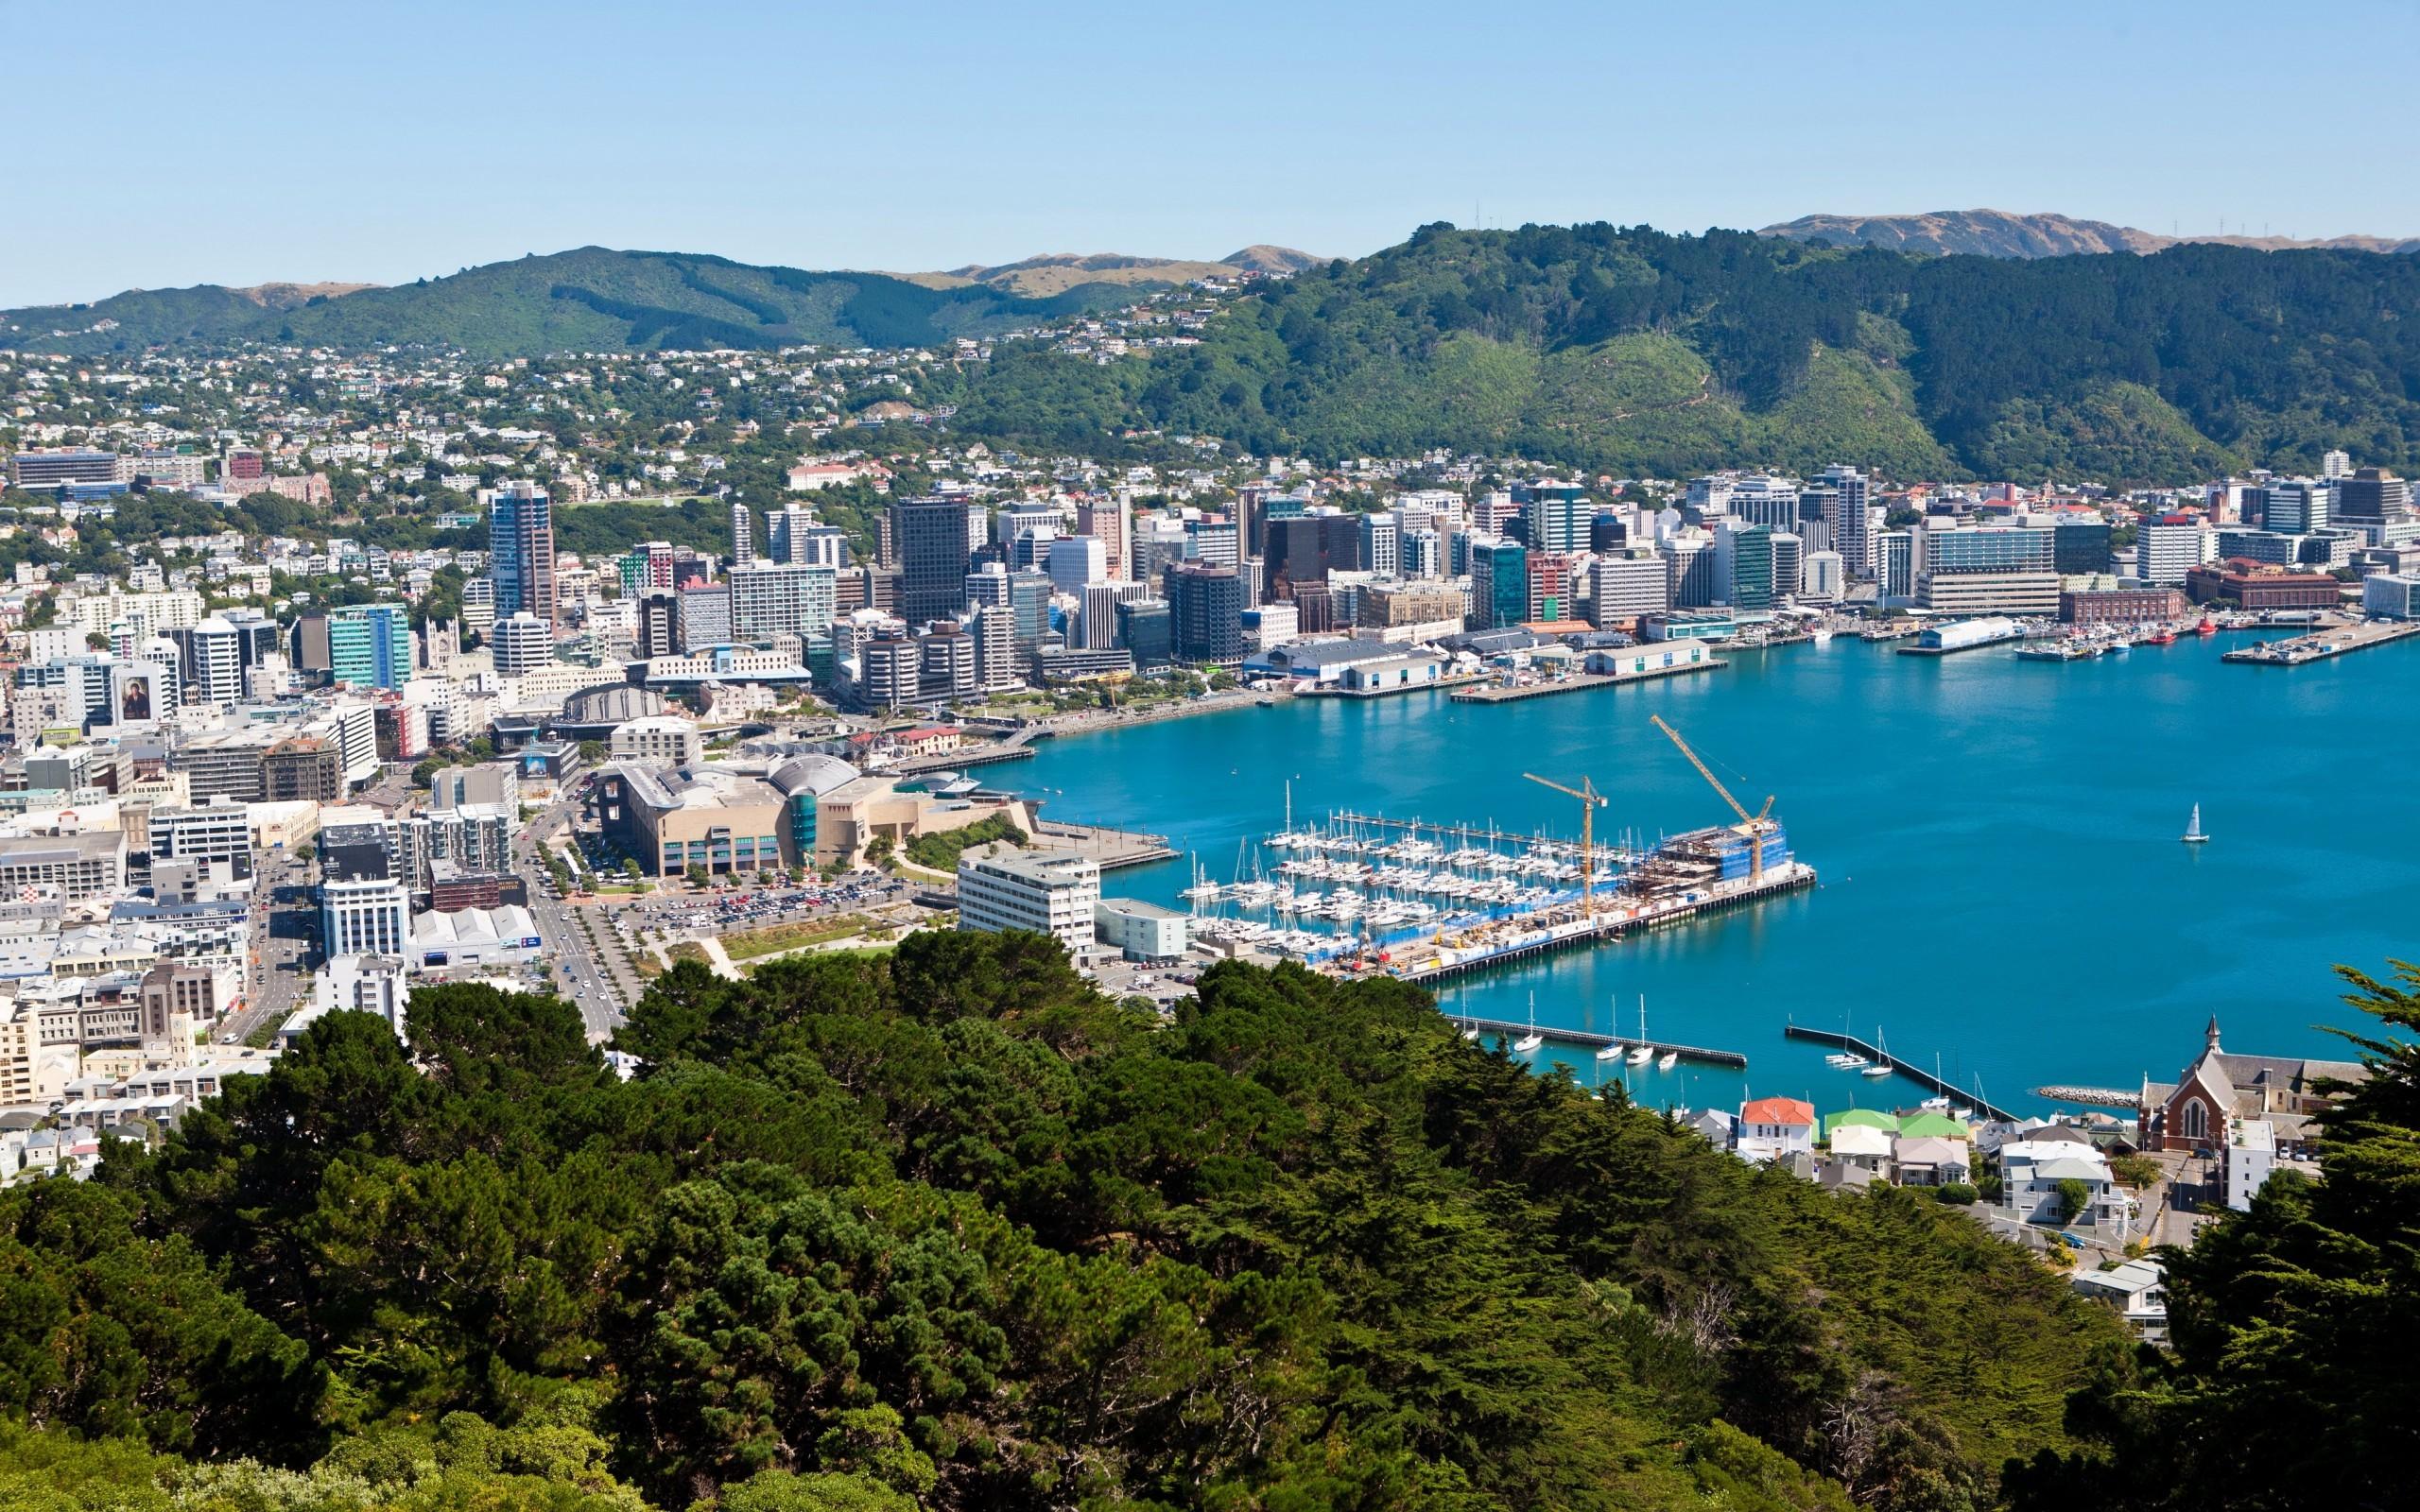 Download 2560x1600 Cityscape New Zealand Wellington Coast 2560x1600